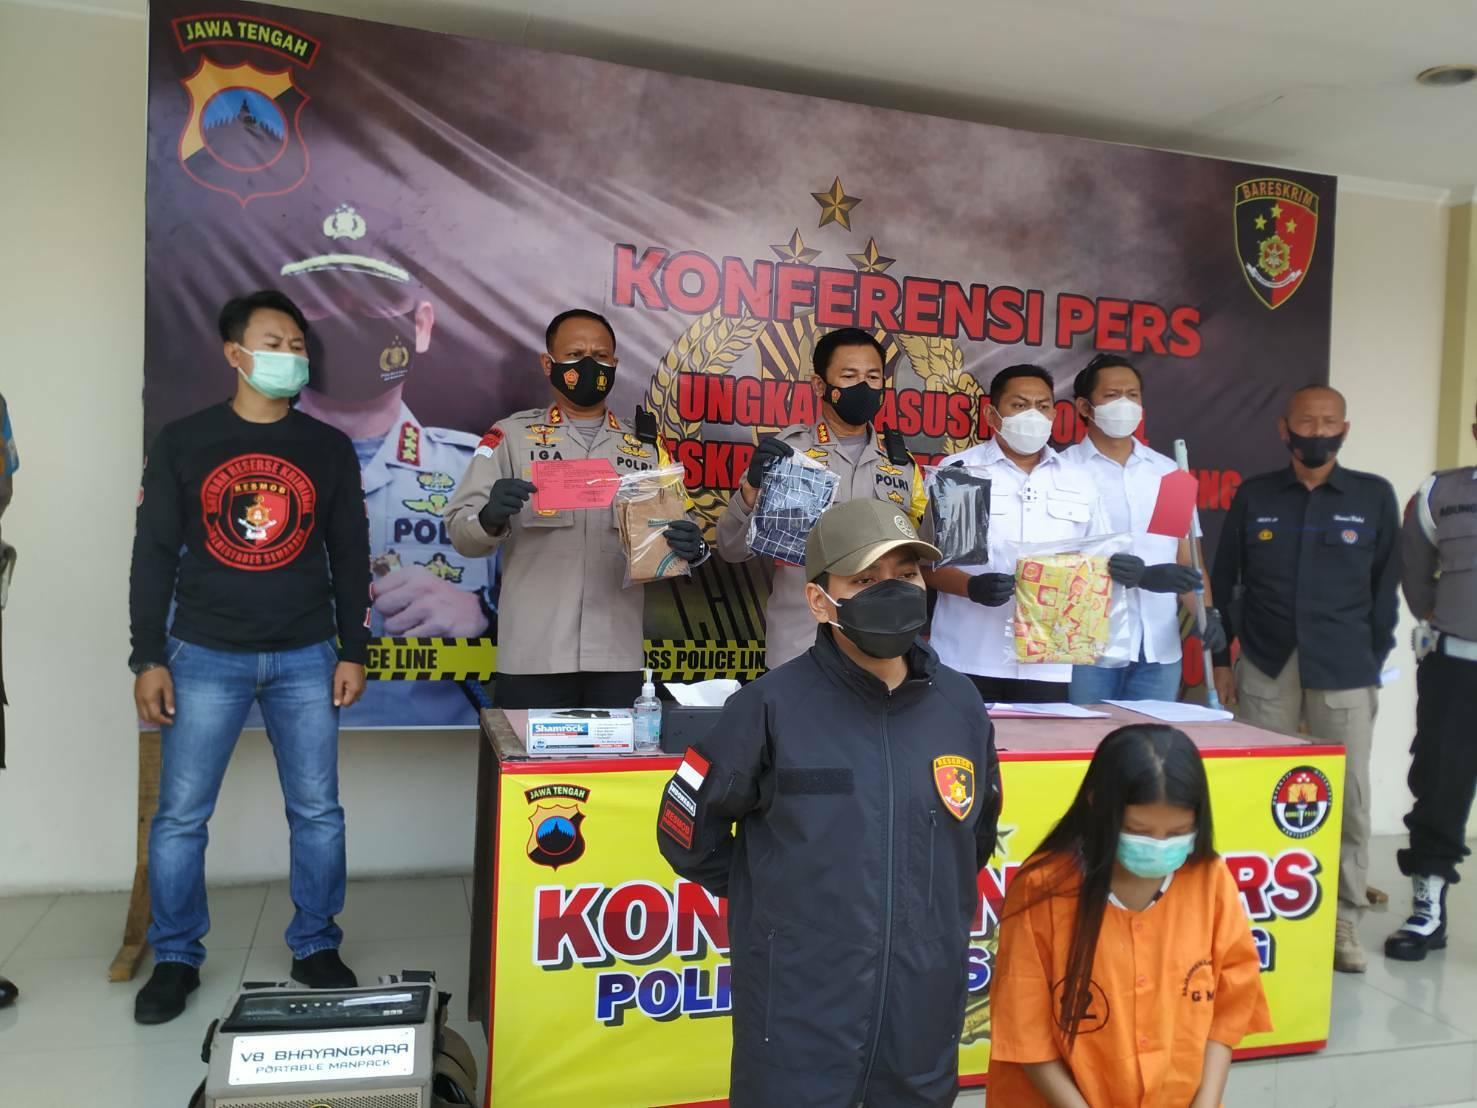 MENUNJUKKAN: Kaolrestabes Semarang saat menunjukkan barang bukti dalam jumpa pers, baru- baru ini. (RISCA KRISDAYANTI/LINGKAR JATENG)